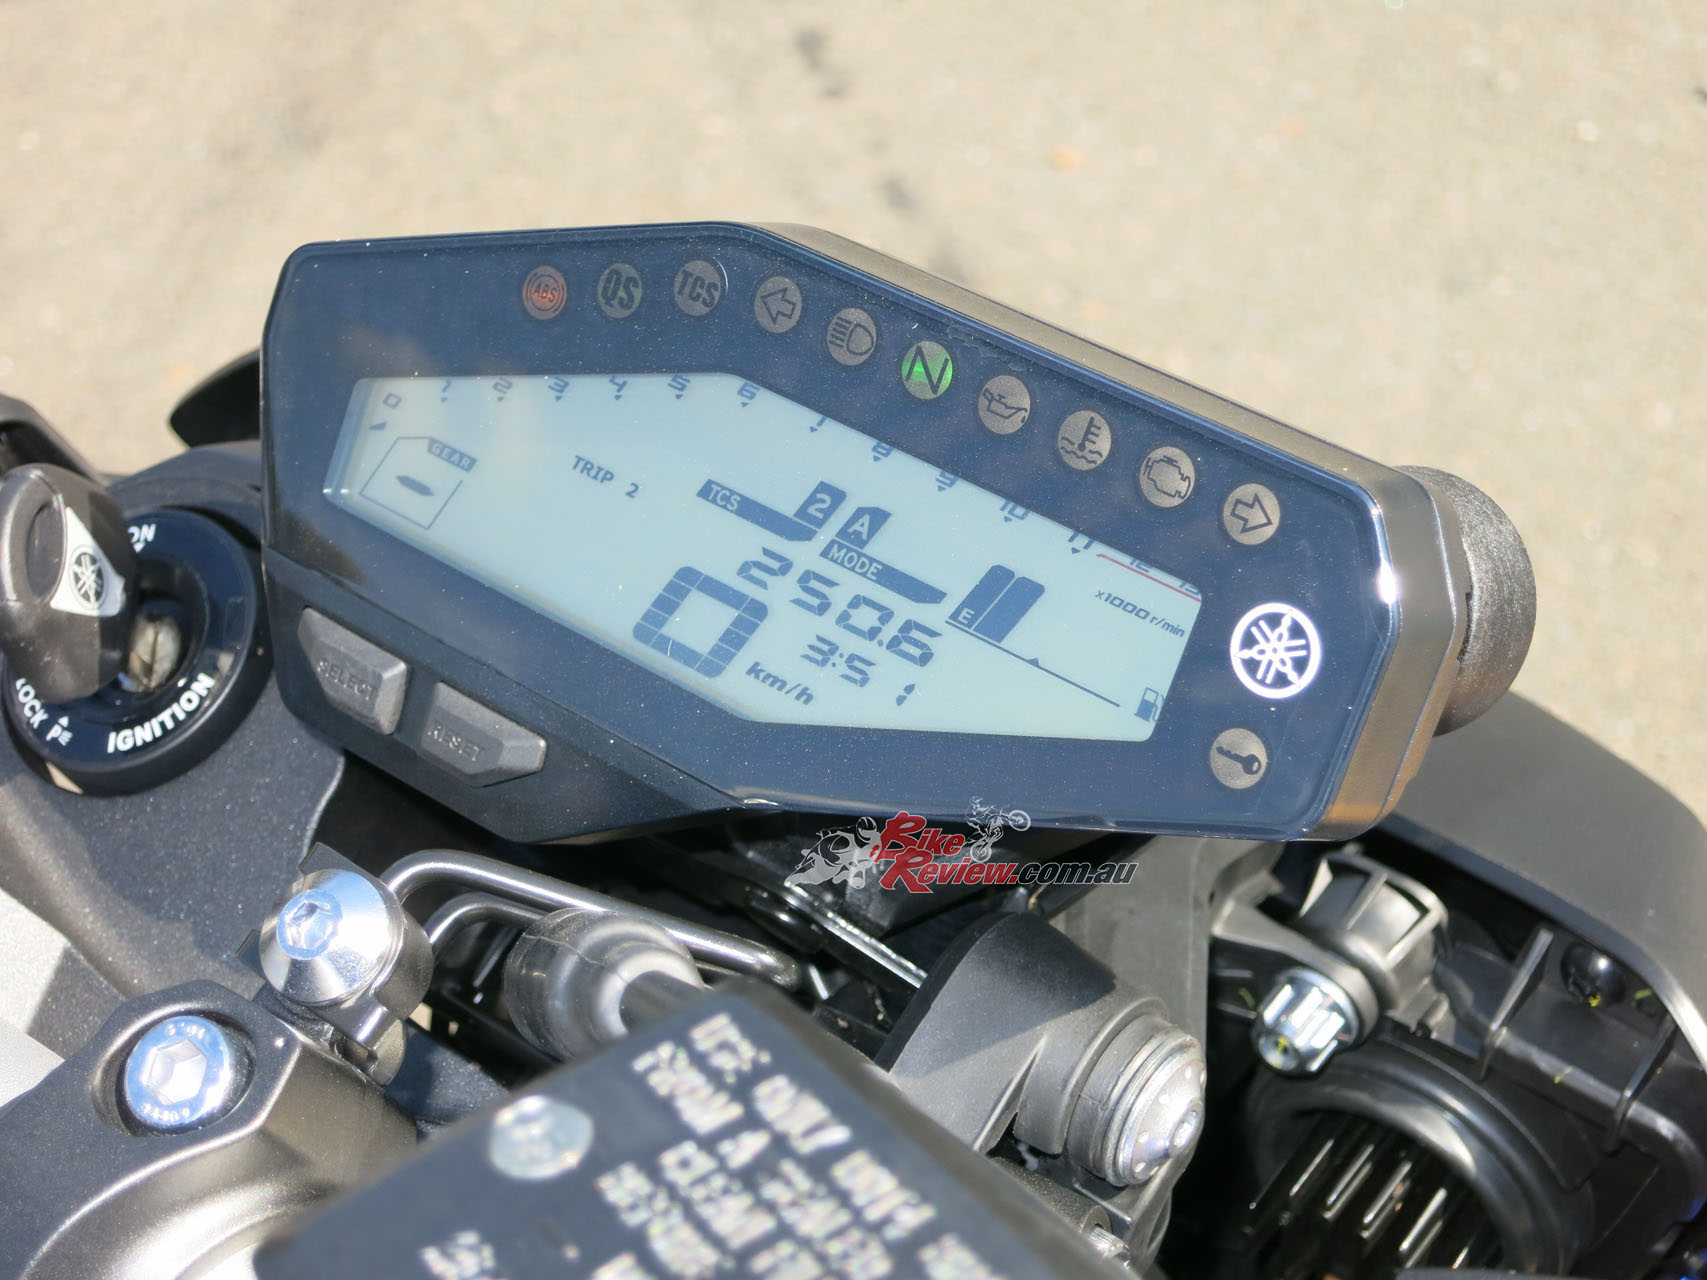 Review: 2017 Yamaha MT-09 - Bike Review